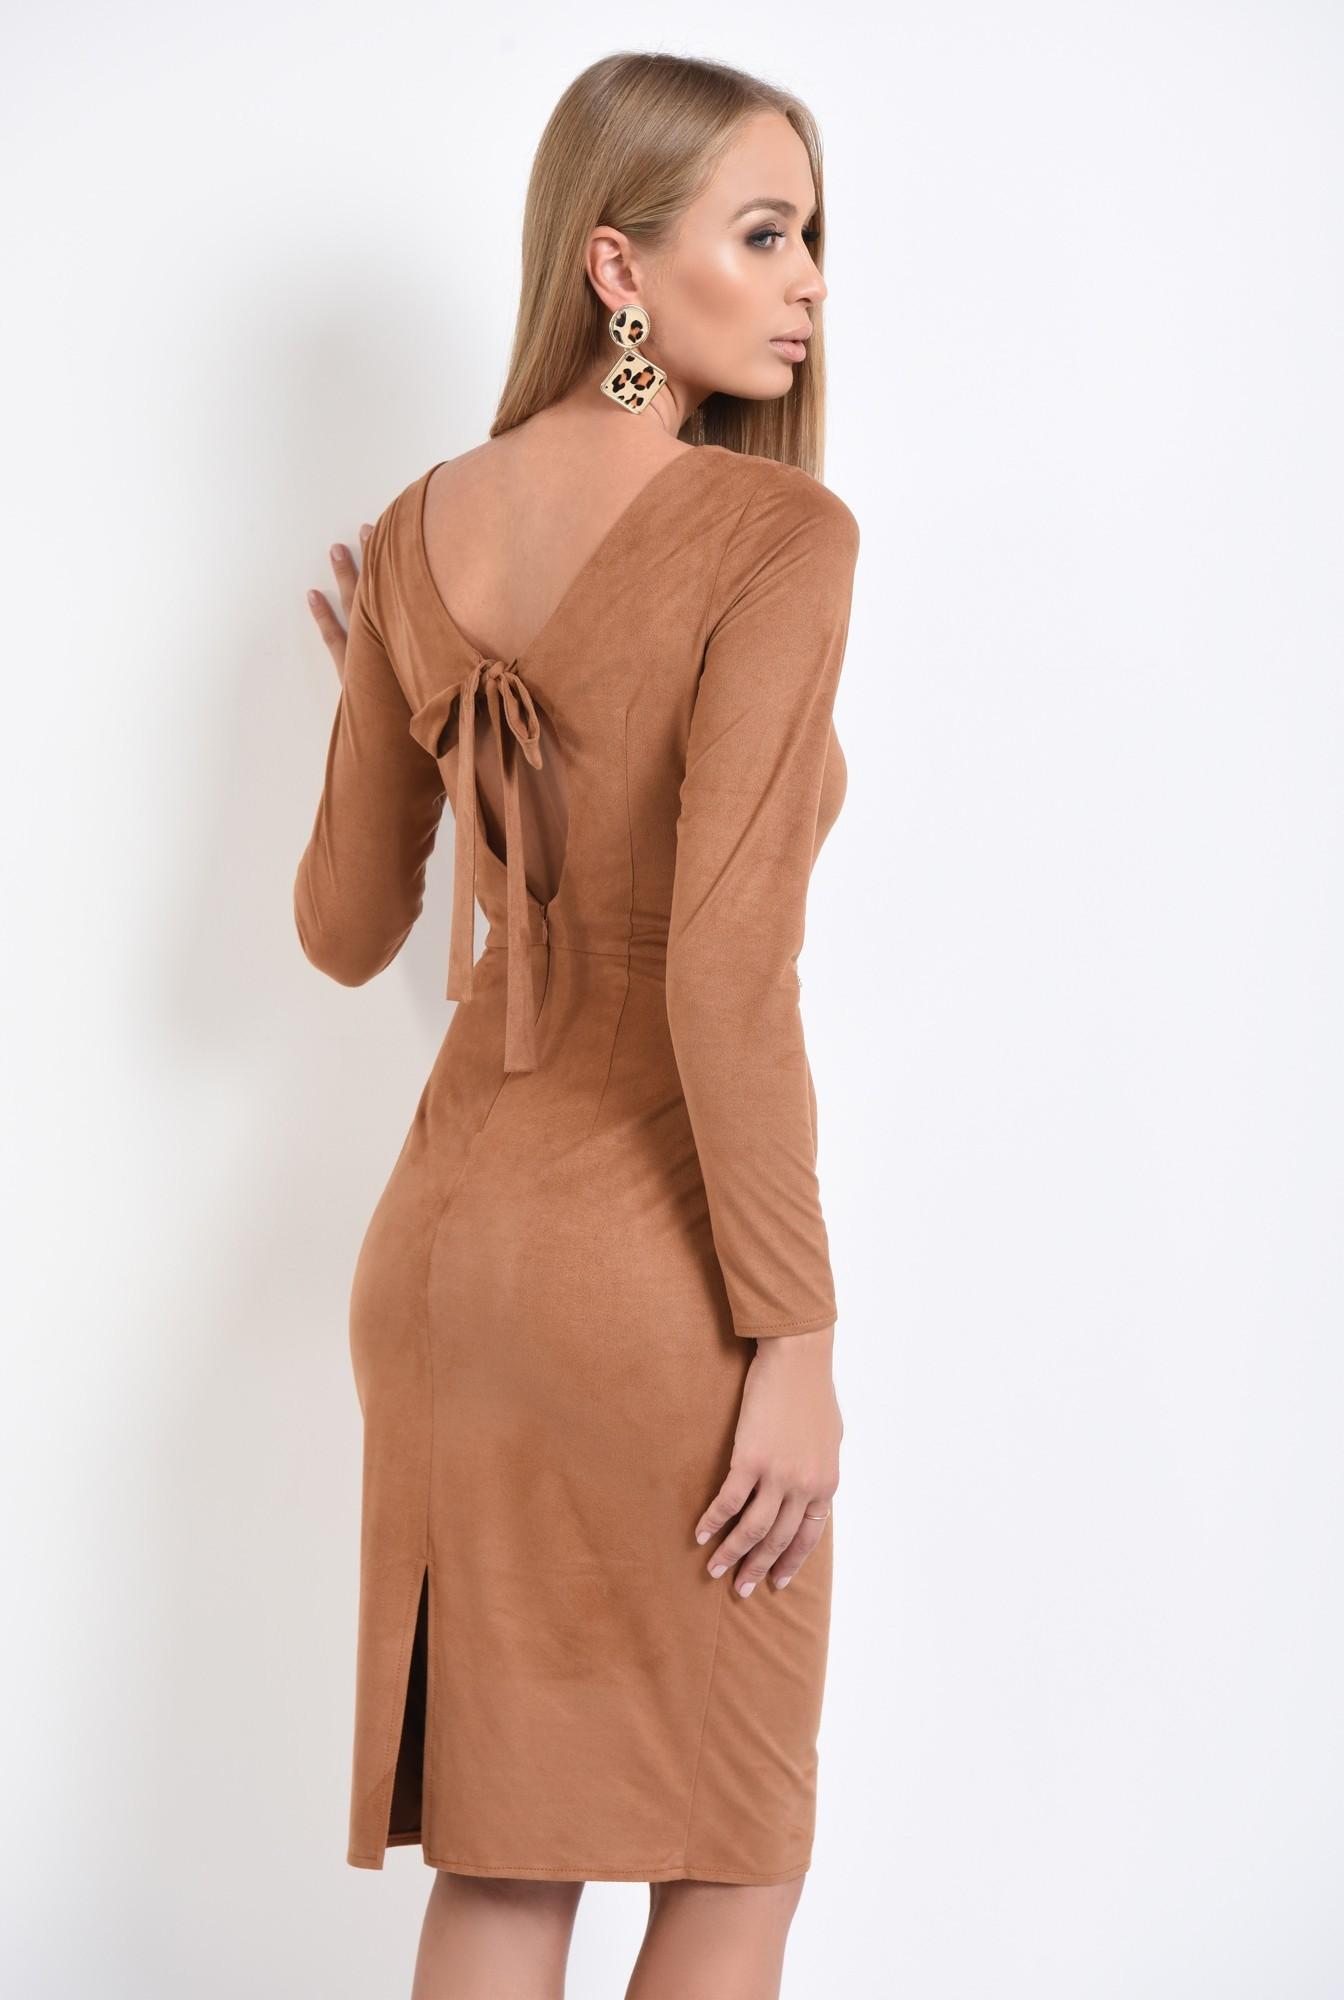 1 - 360 - rochie eleganta, piele intoarsa eco, maro